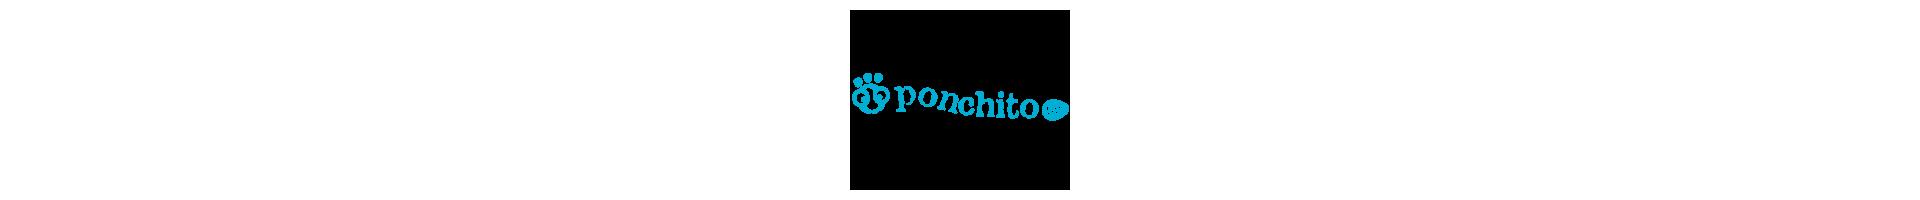 Ponchito